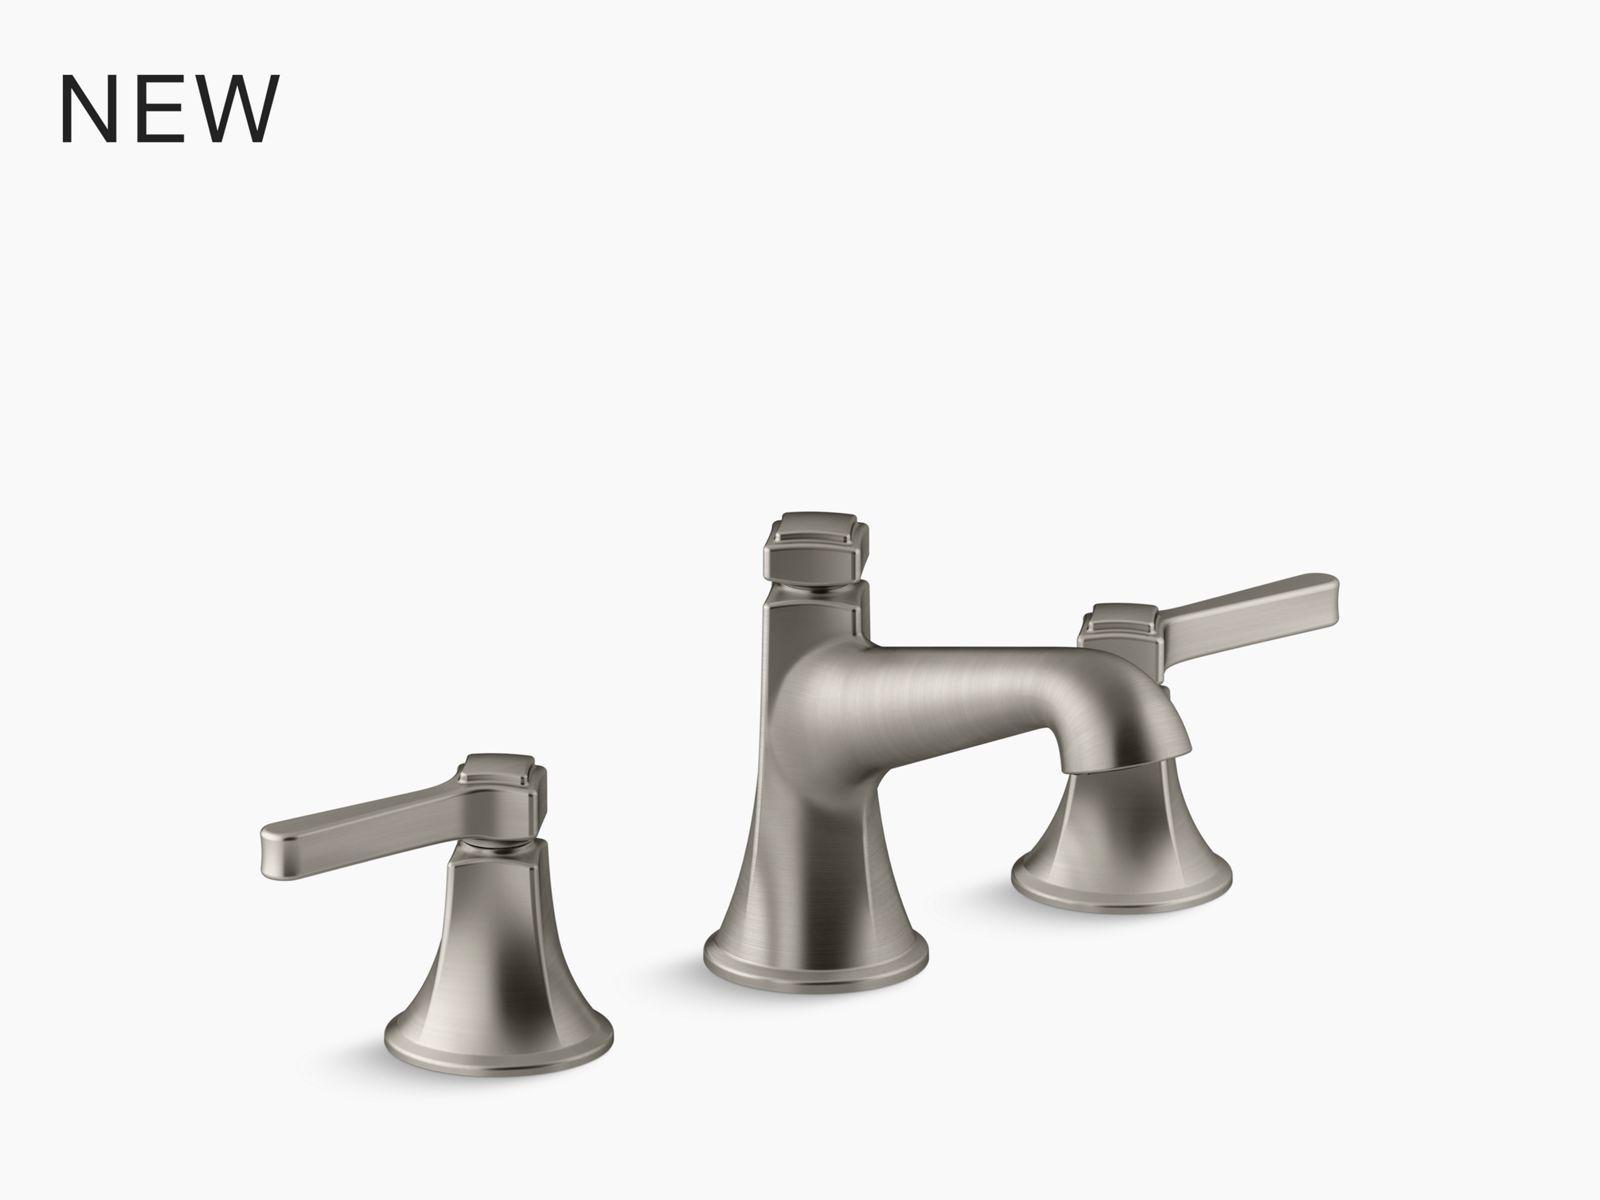 bannon 22 1 4 x 18 1 4 x 23 wall mount service sink